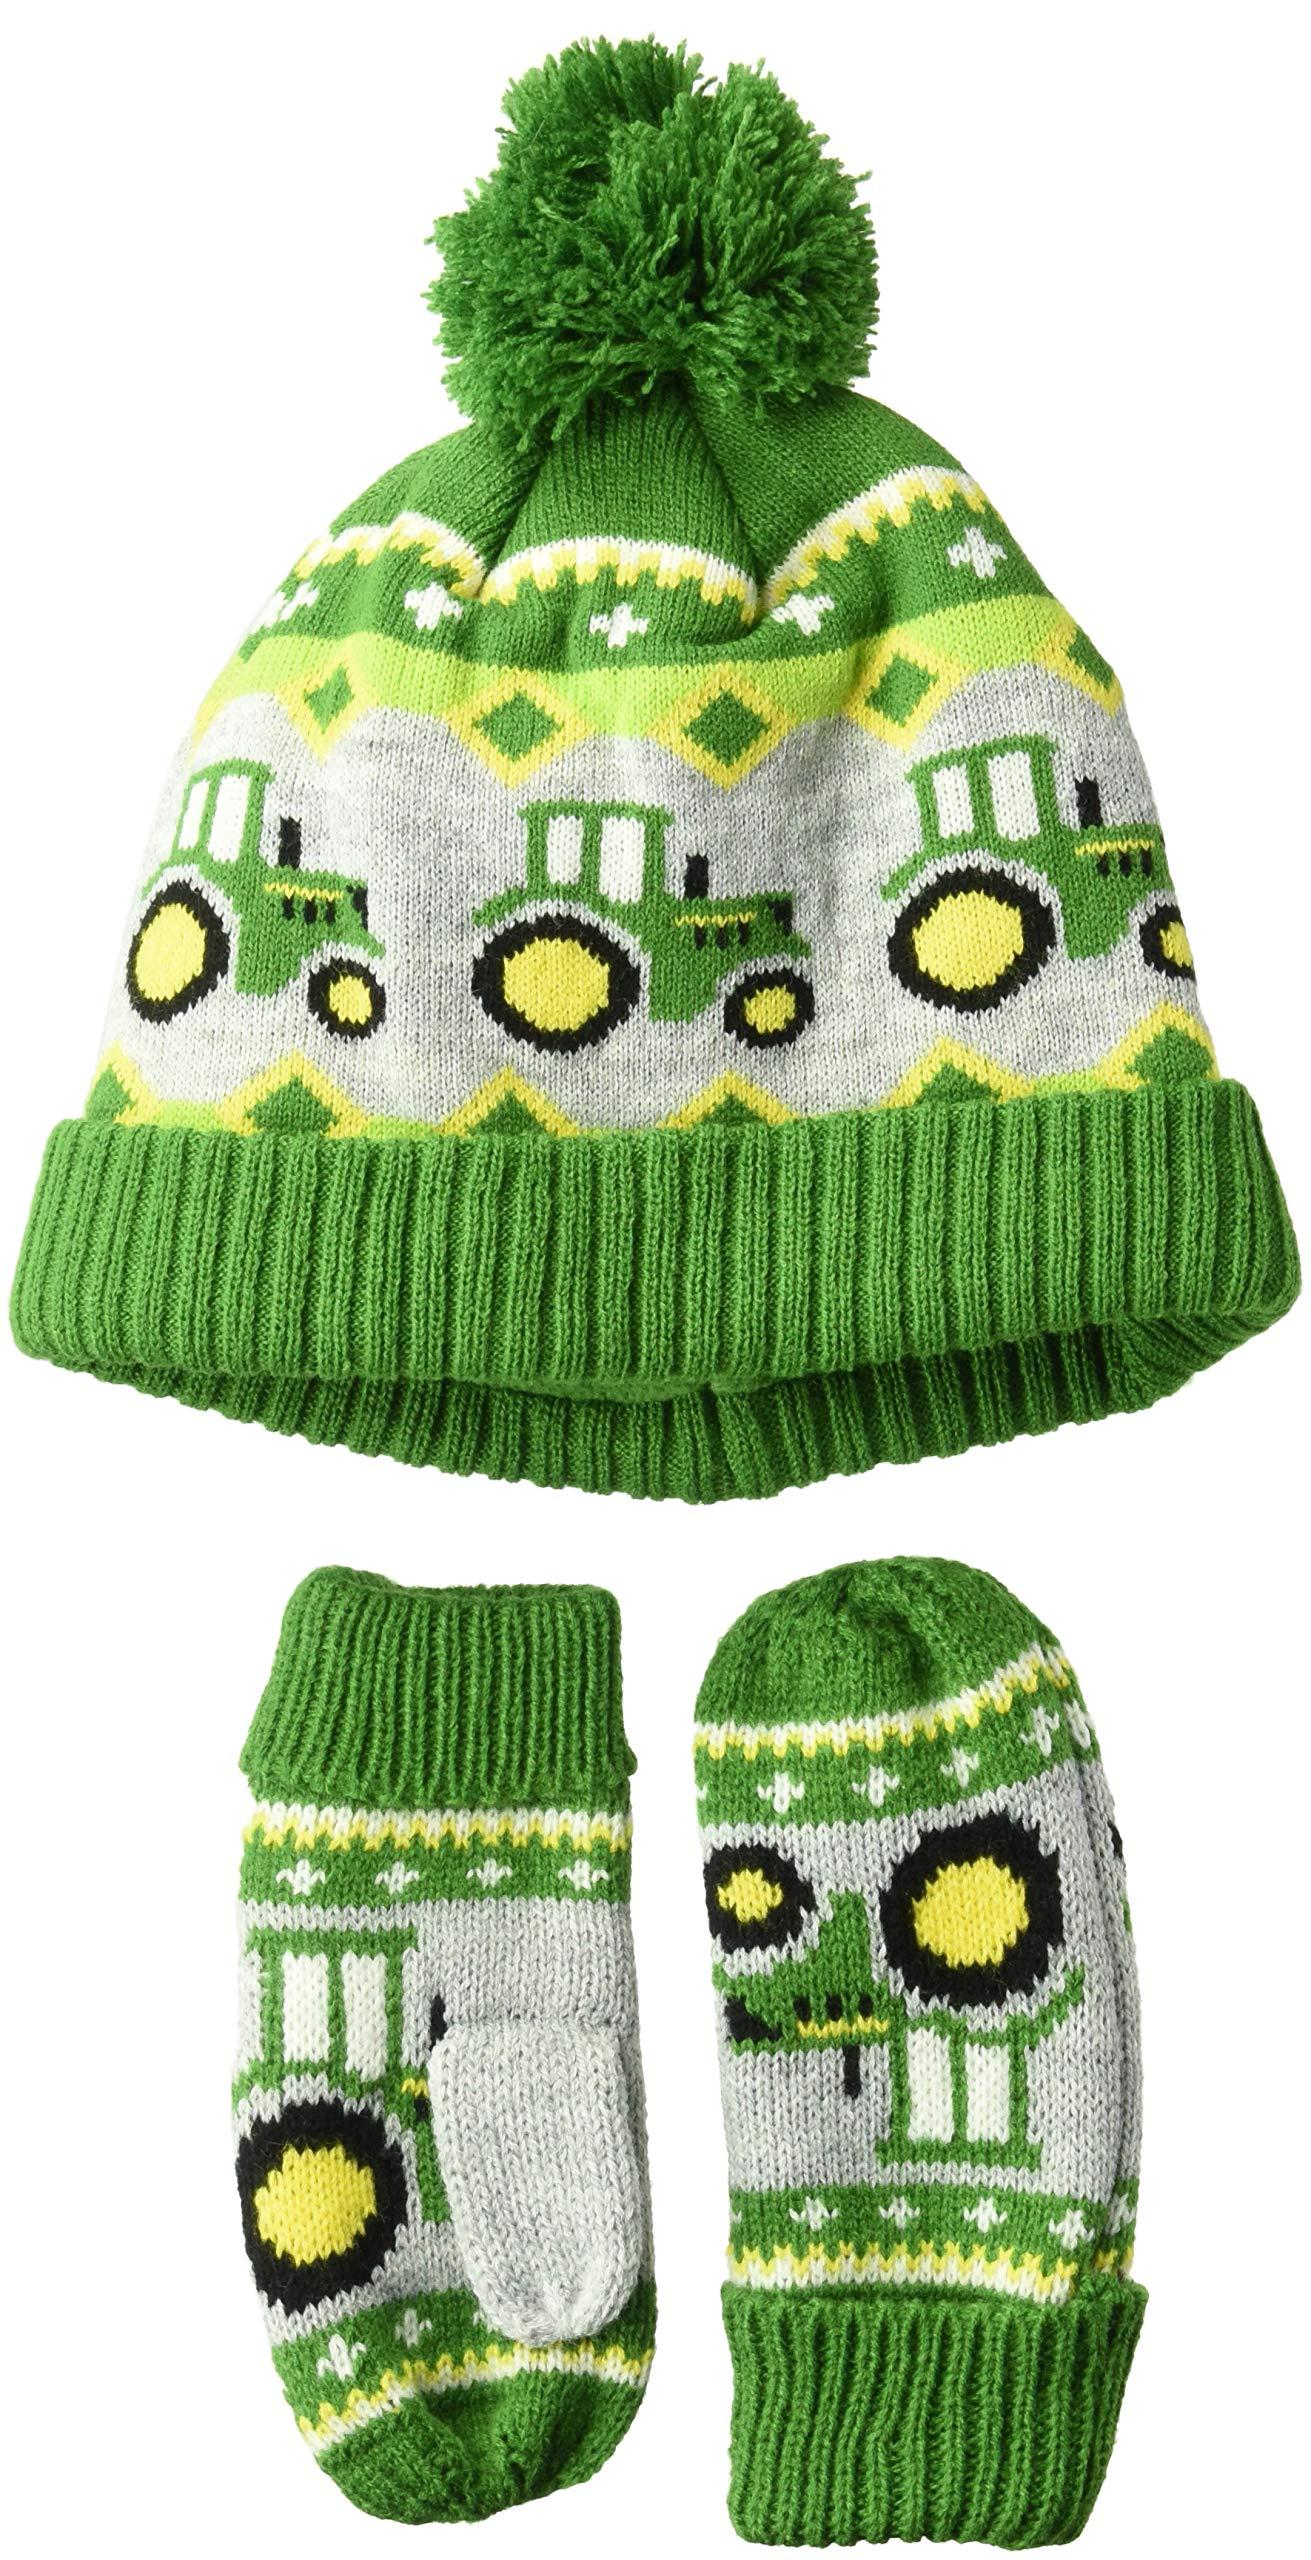 John Deere Boys' Toddler Winter Cap, Green